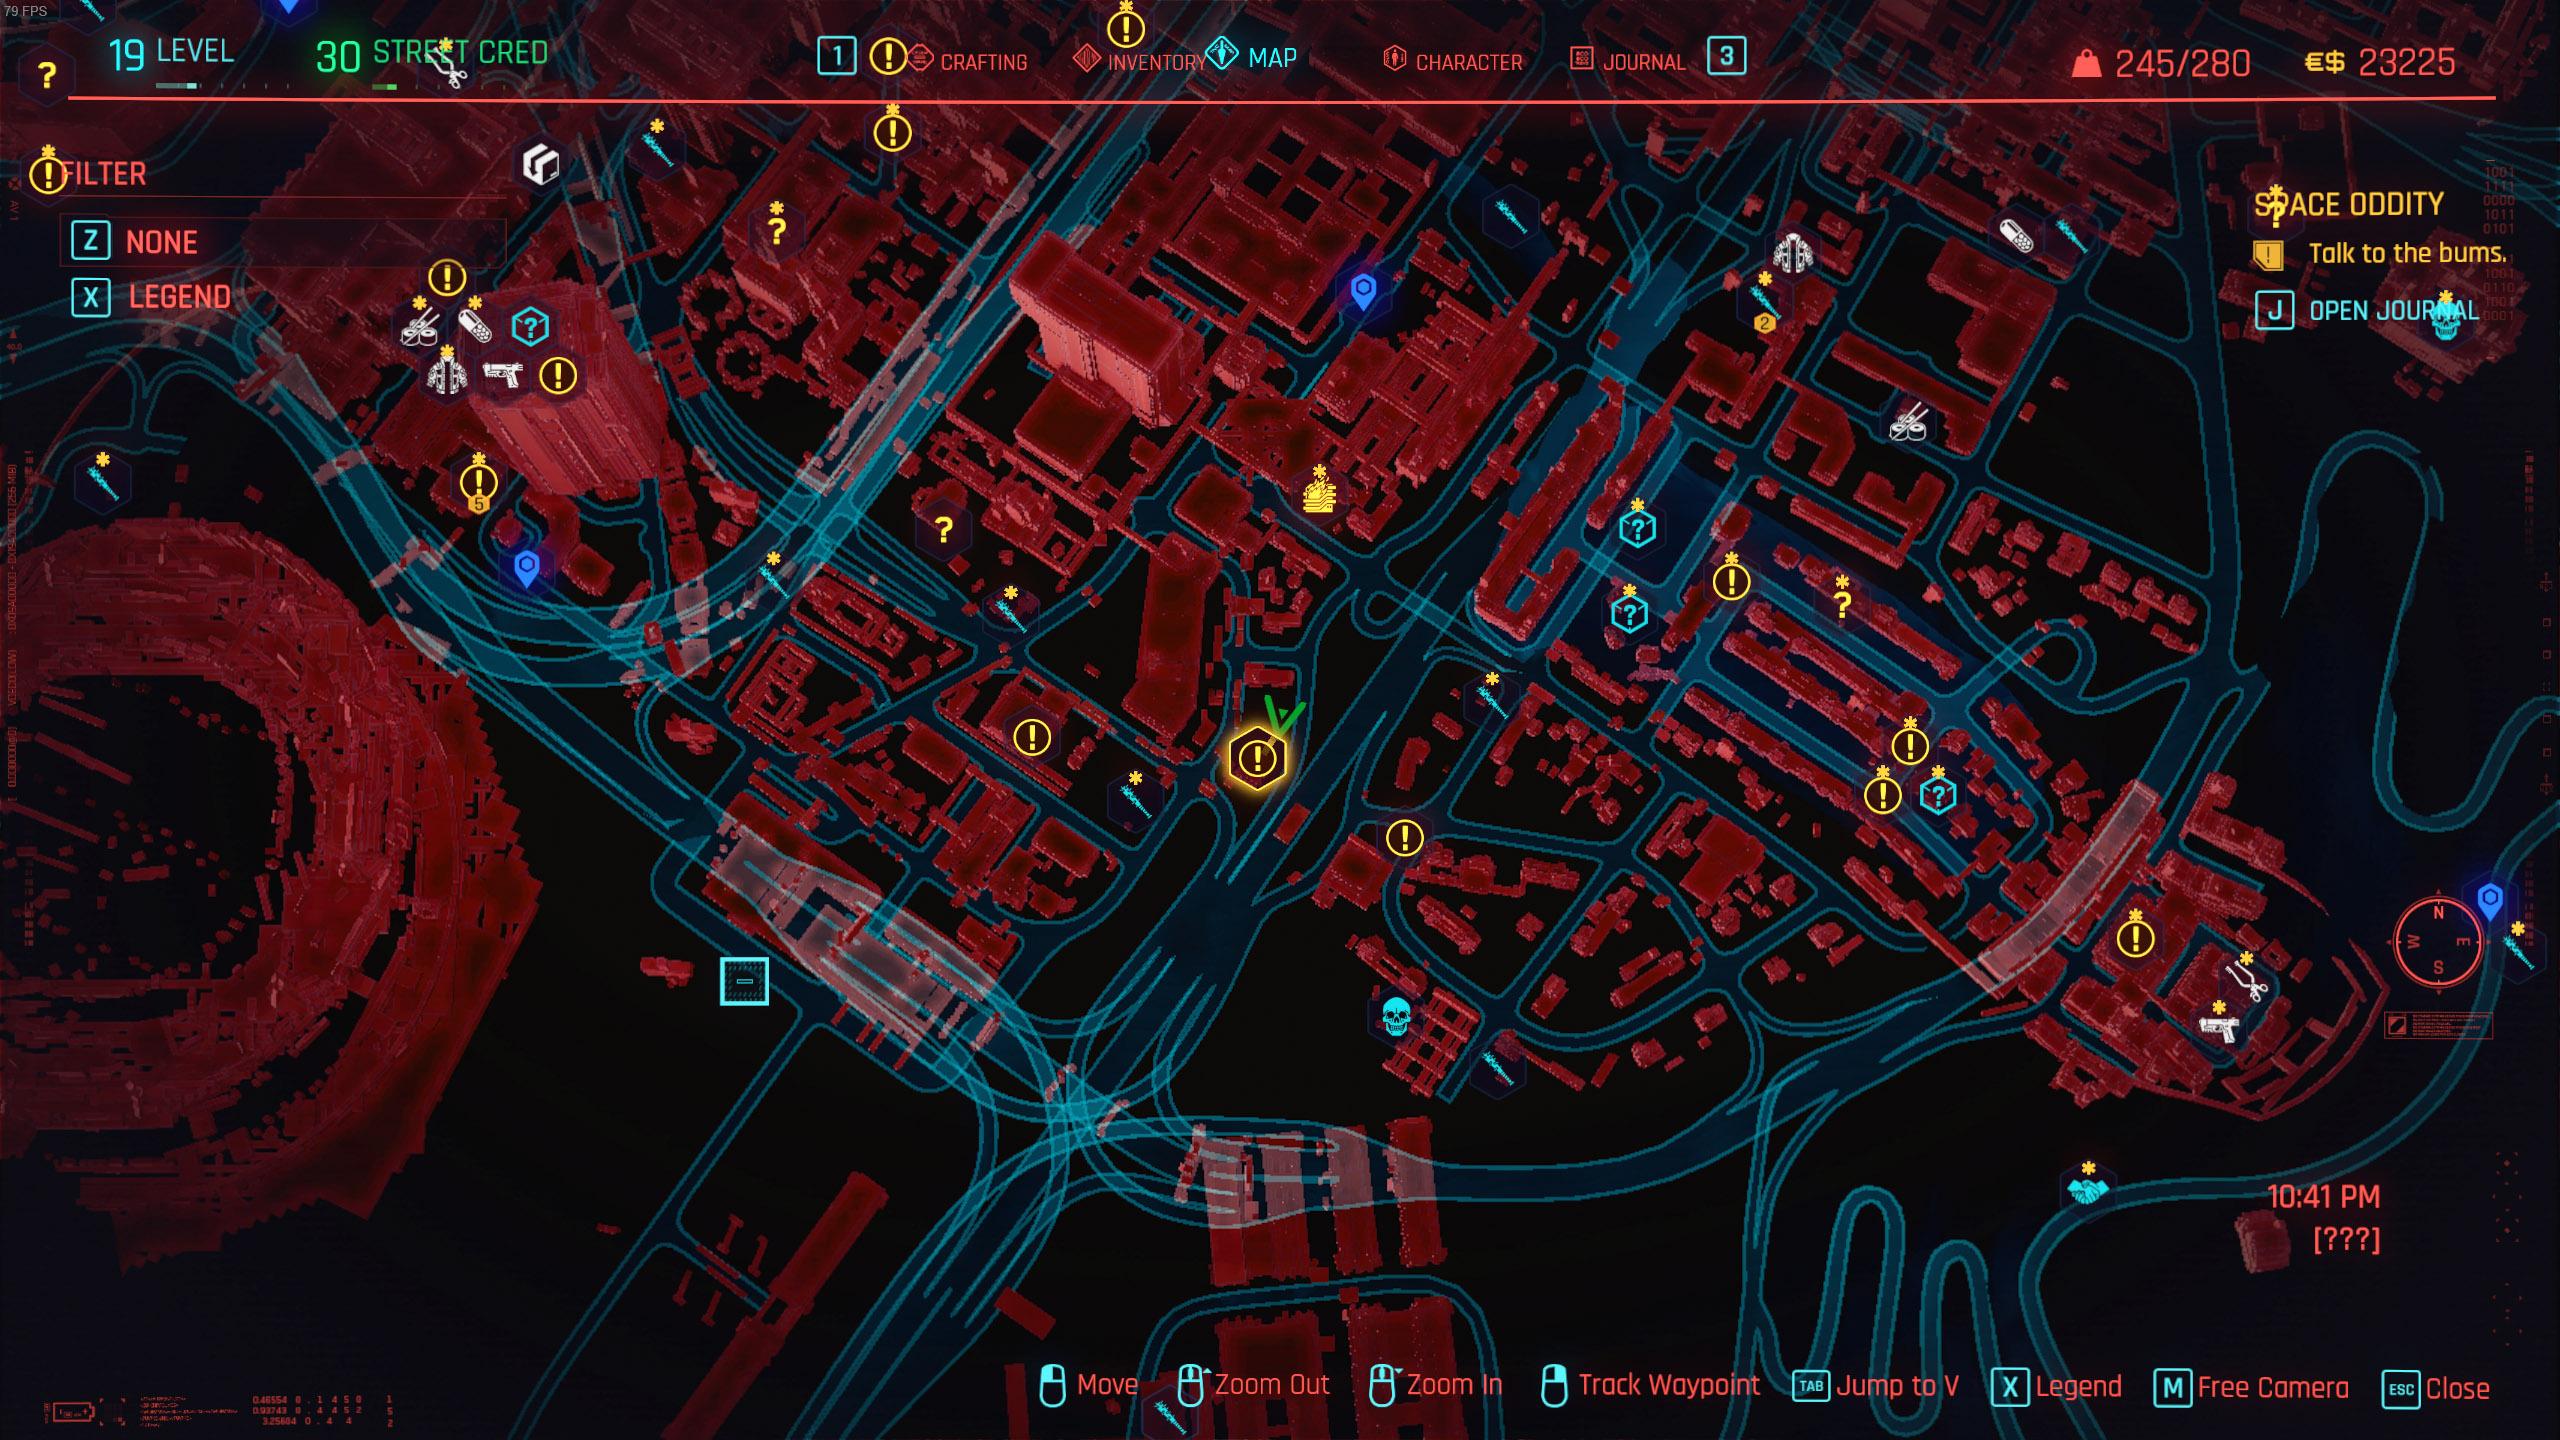 cyberpunk 2077 money glitch - space oddity quest location